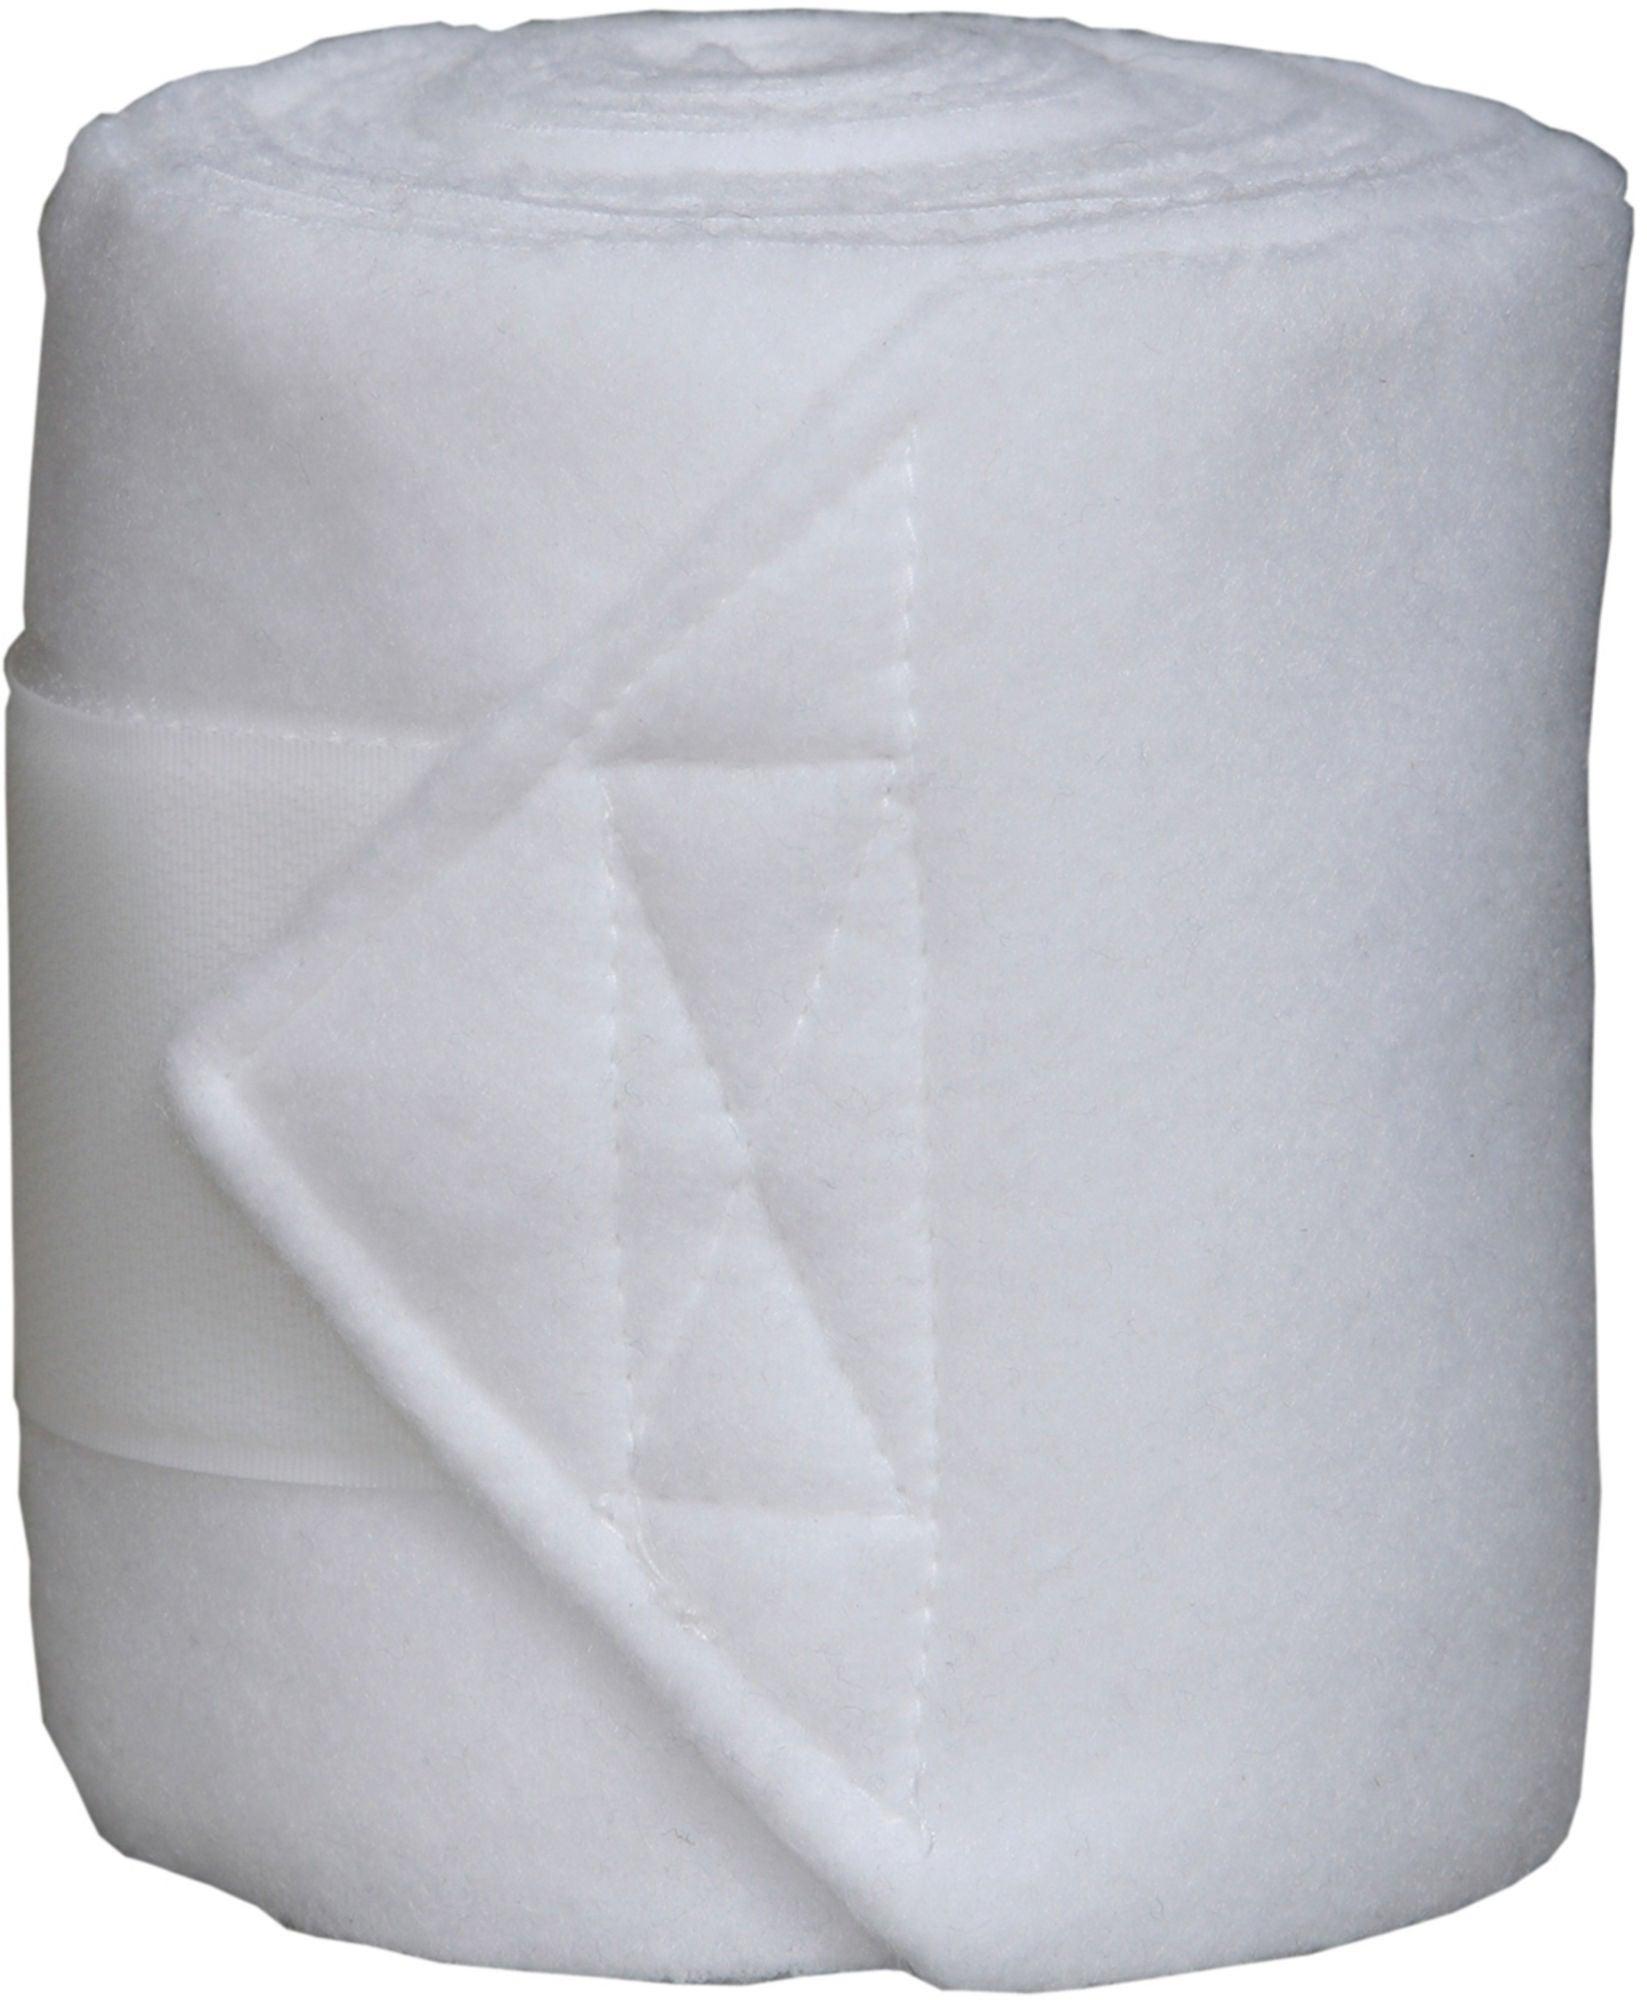 Jacson Fleecebandage 4-Pack, Vit